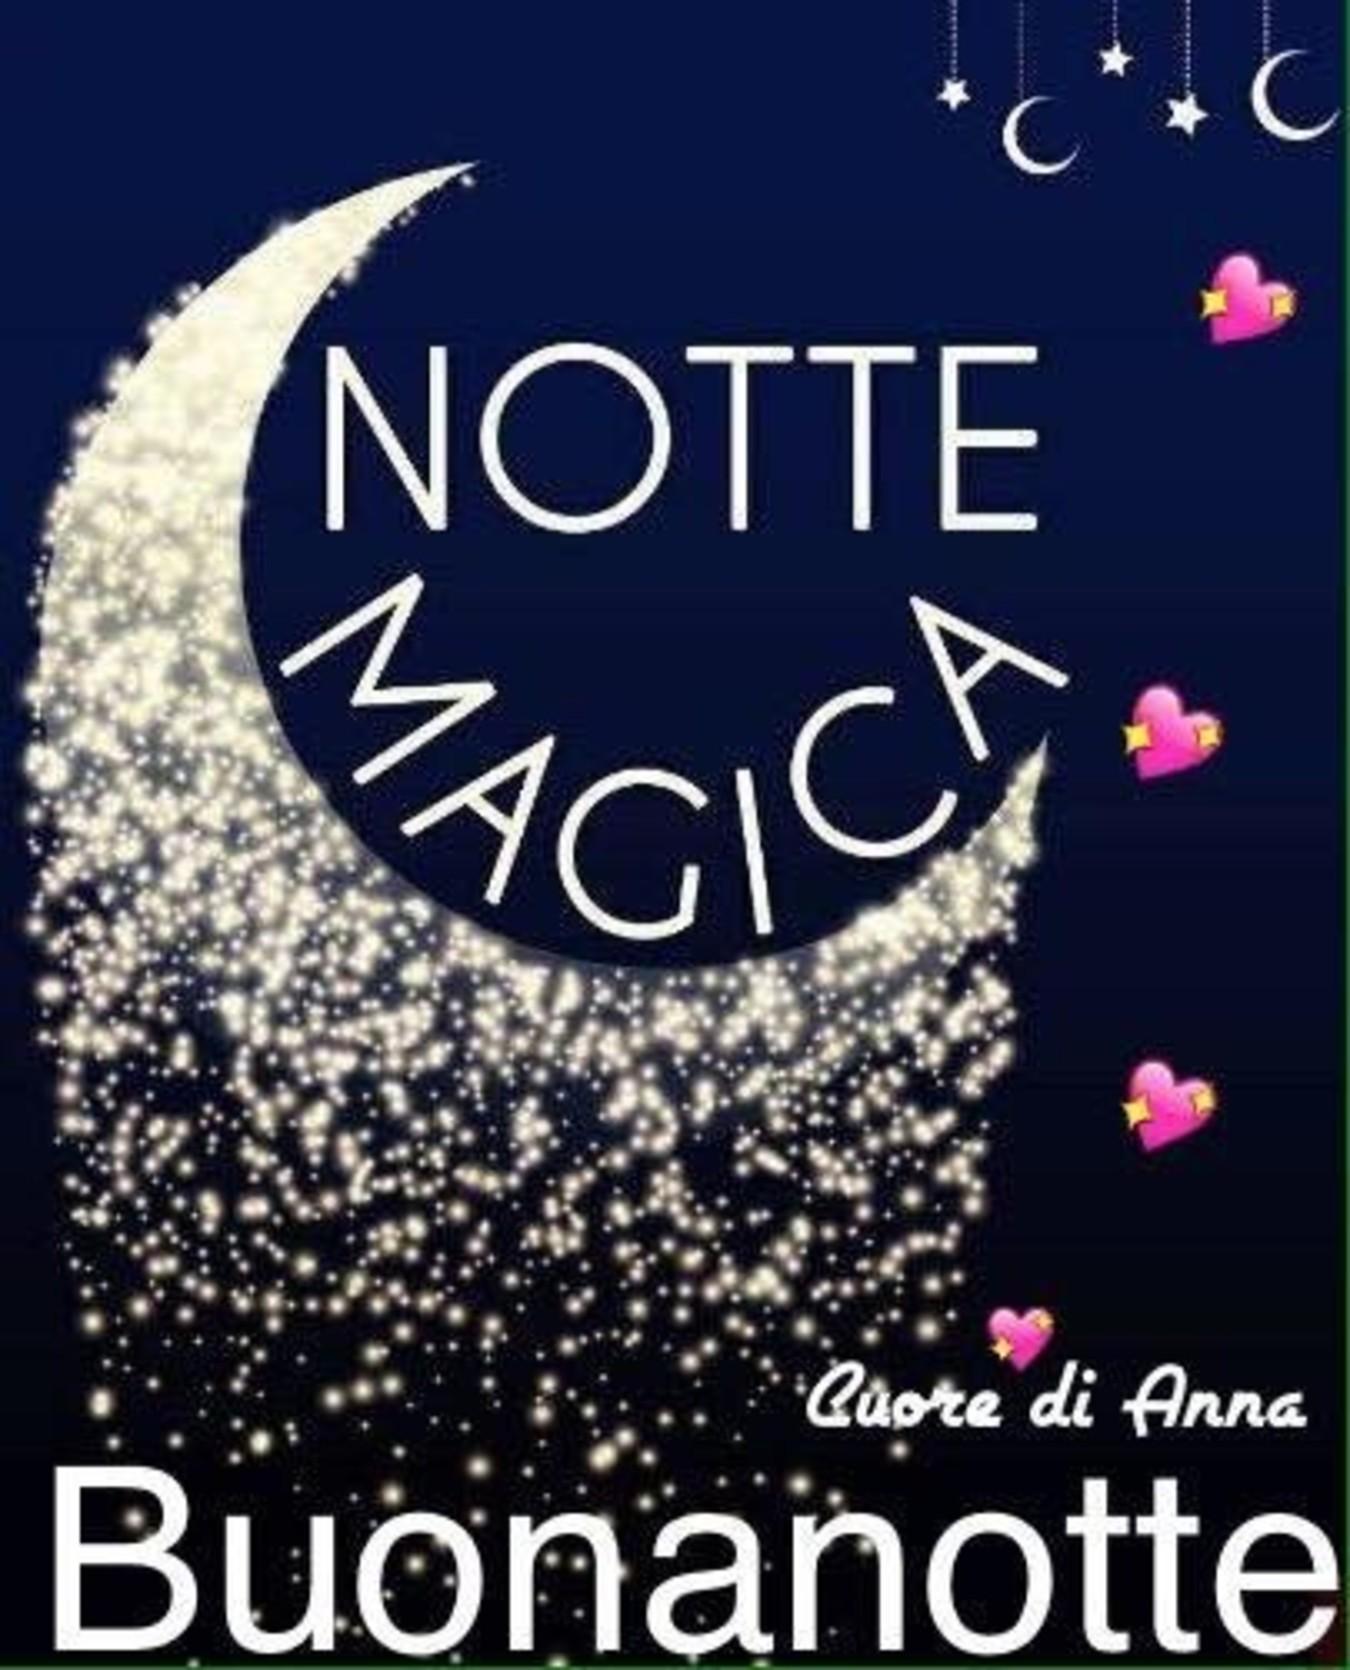 Buonanotte Dolce 3 Immaginifacebook It